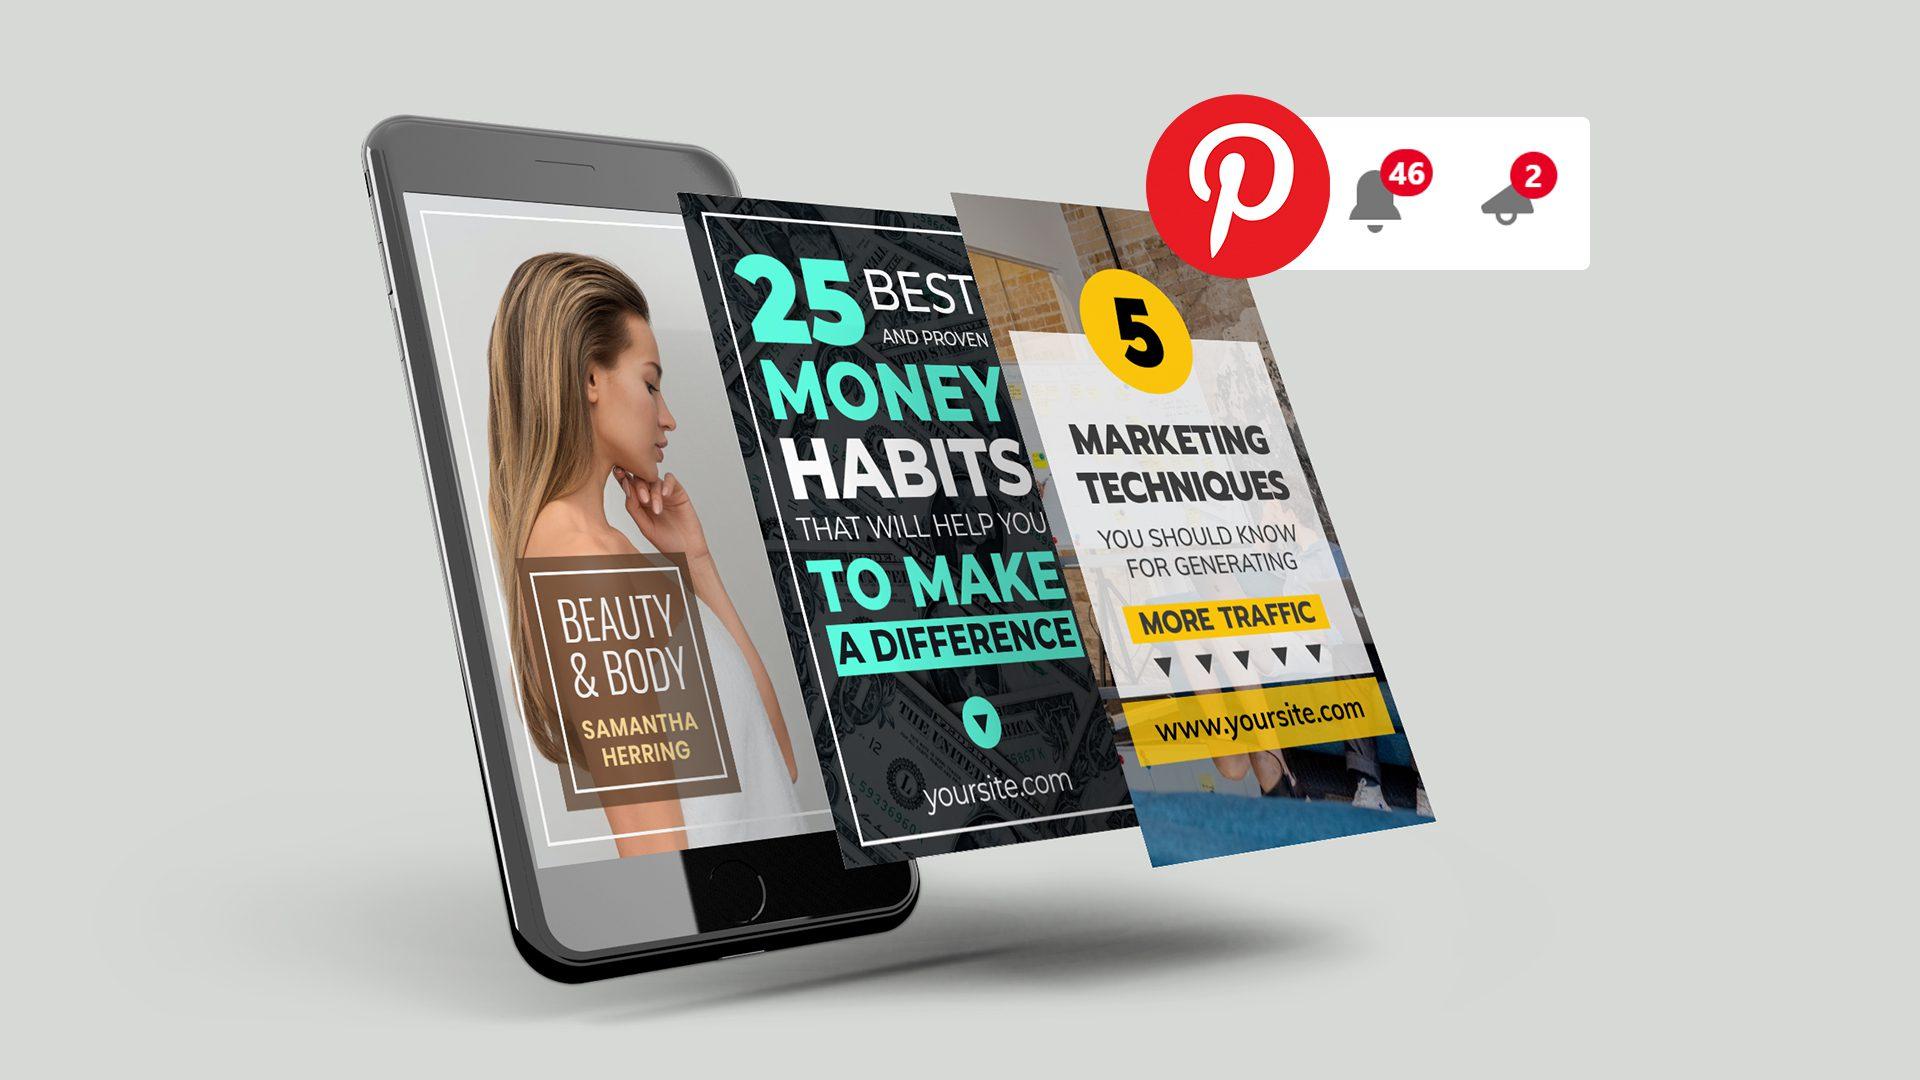 pinterest-pin-templates-editable-banners